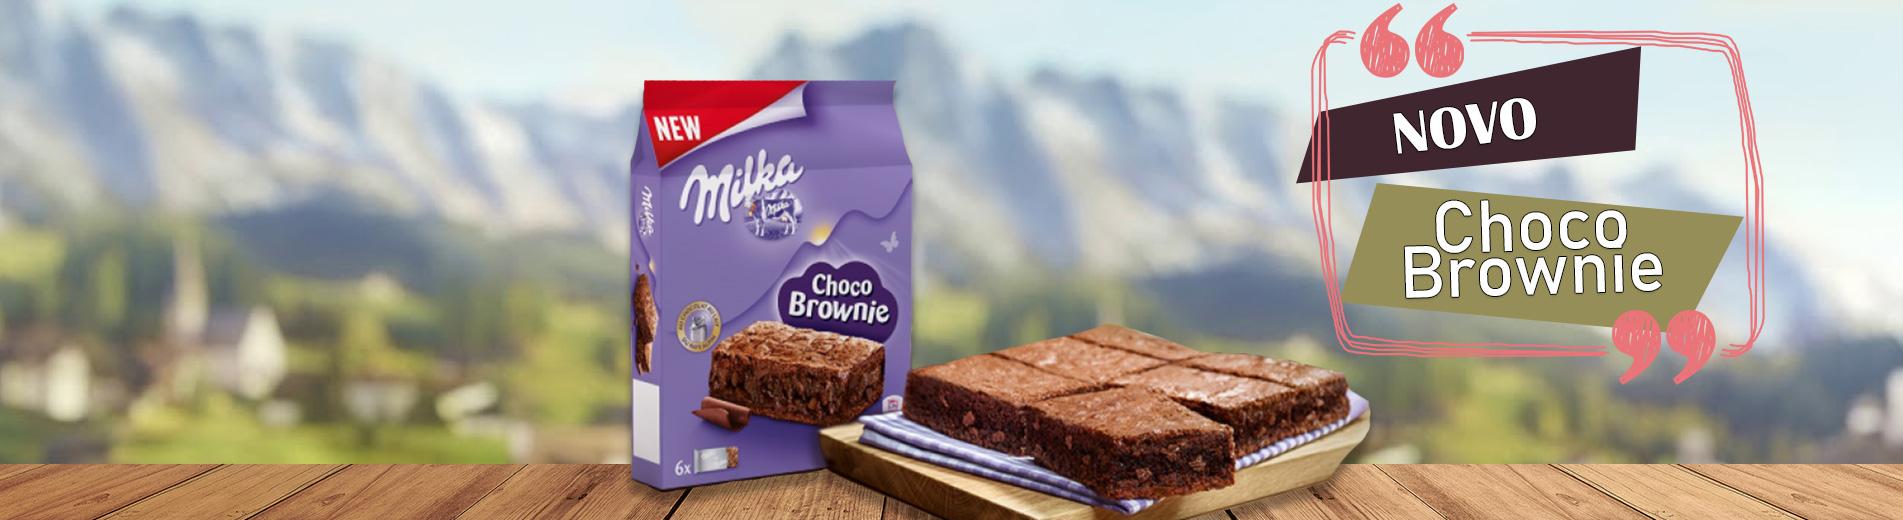 CHOCO BROWNIE